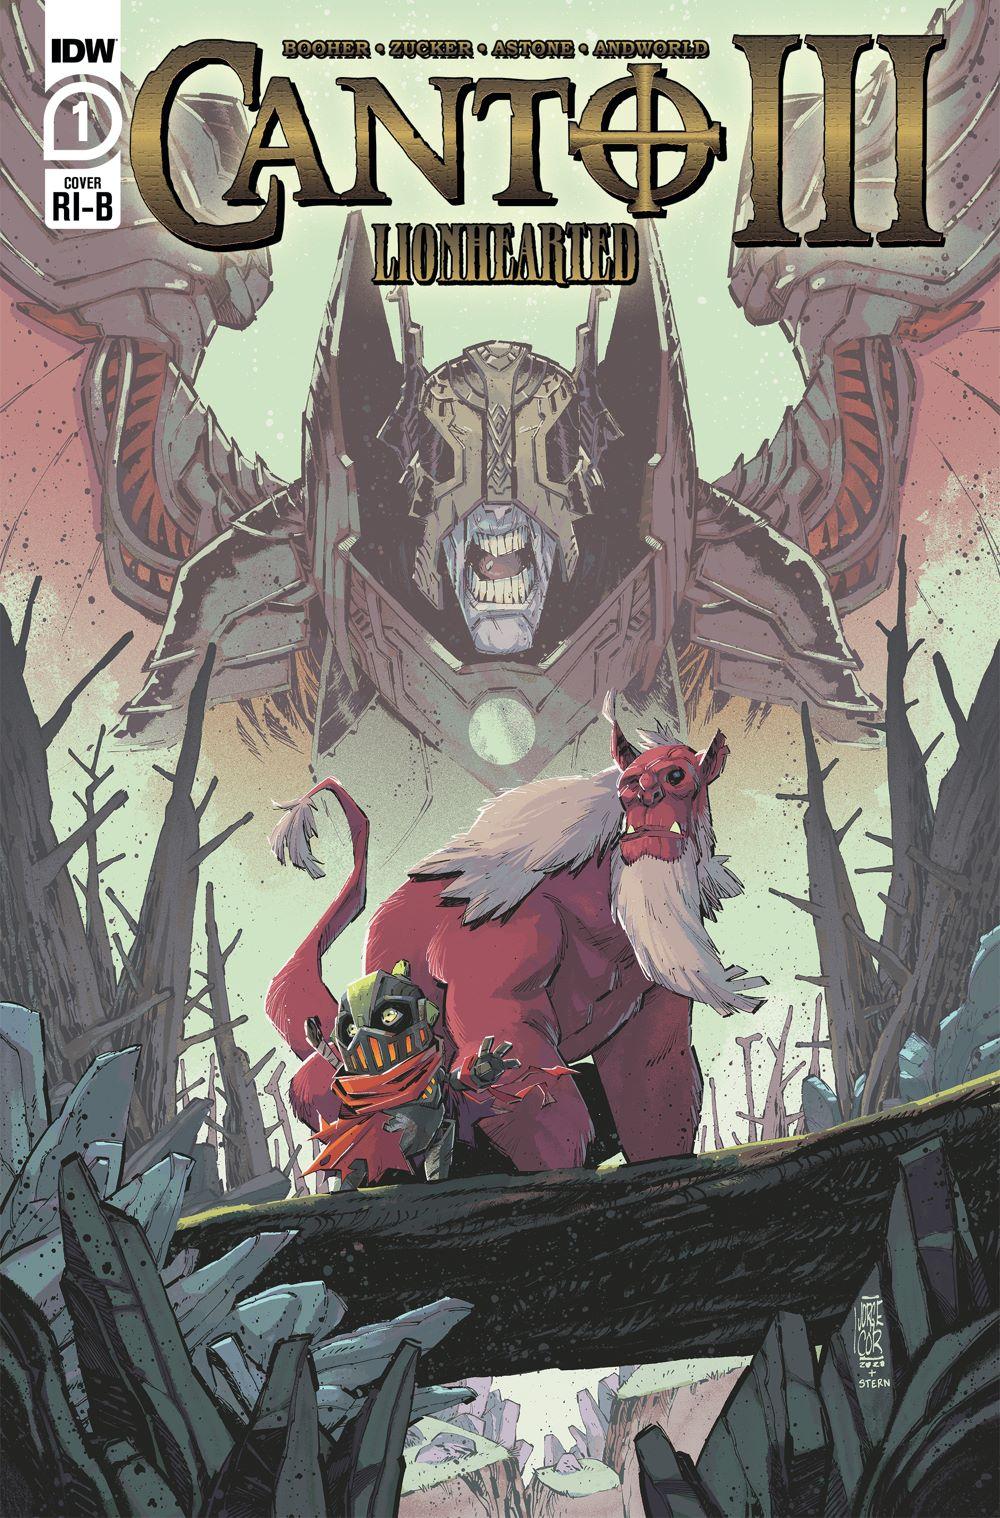 Canto-Lionhearted01_cvrRI-B ComicList Previews: CANTO III LIONHEARTED #1 (OF 6)